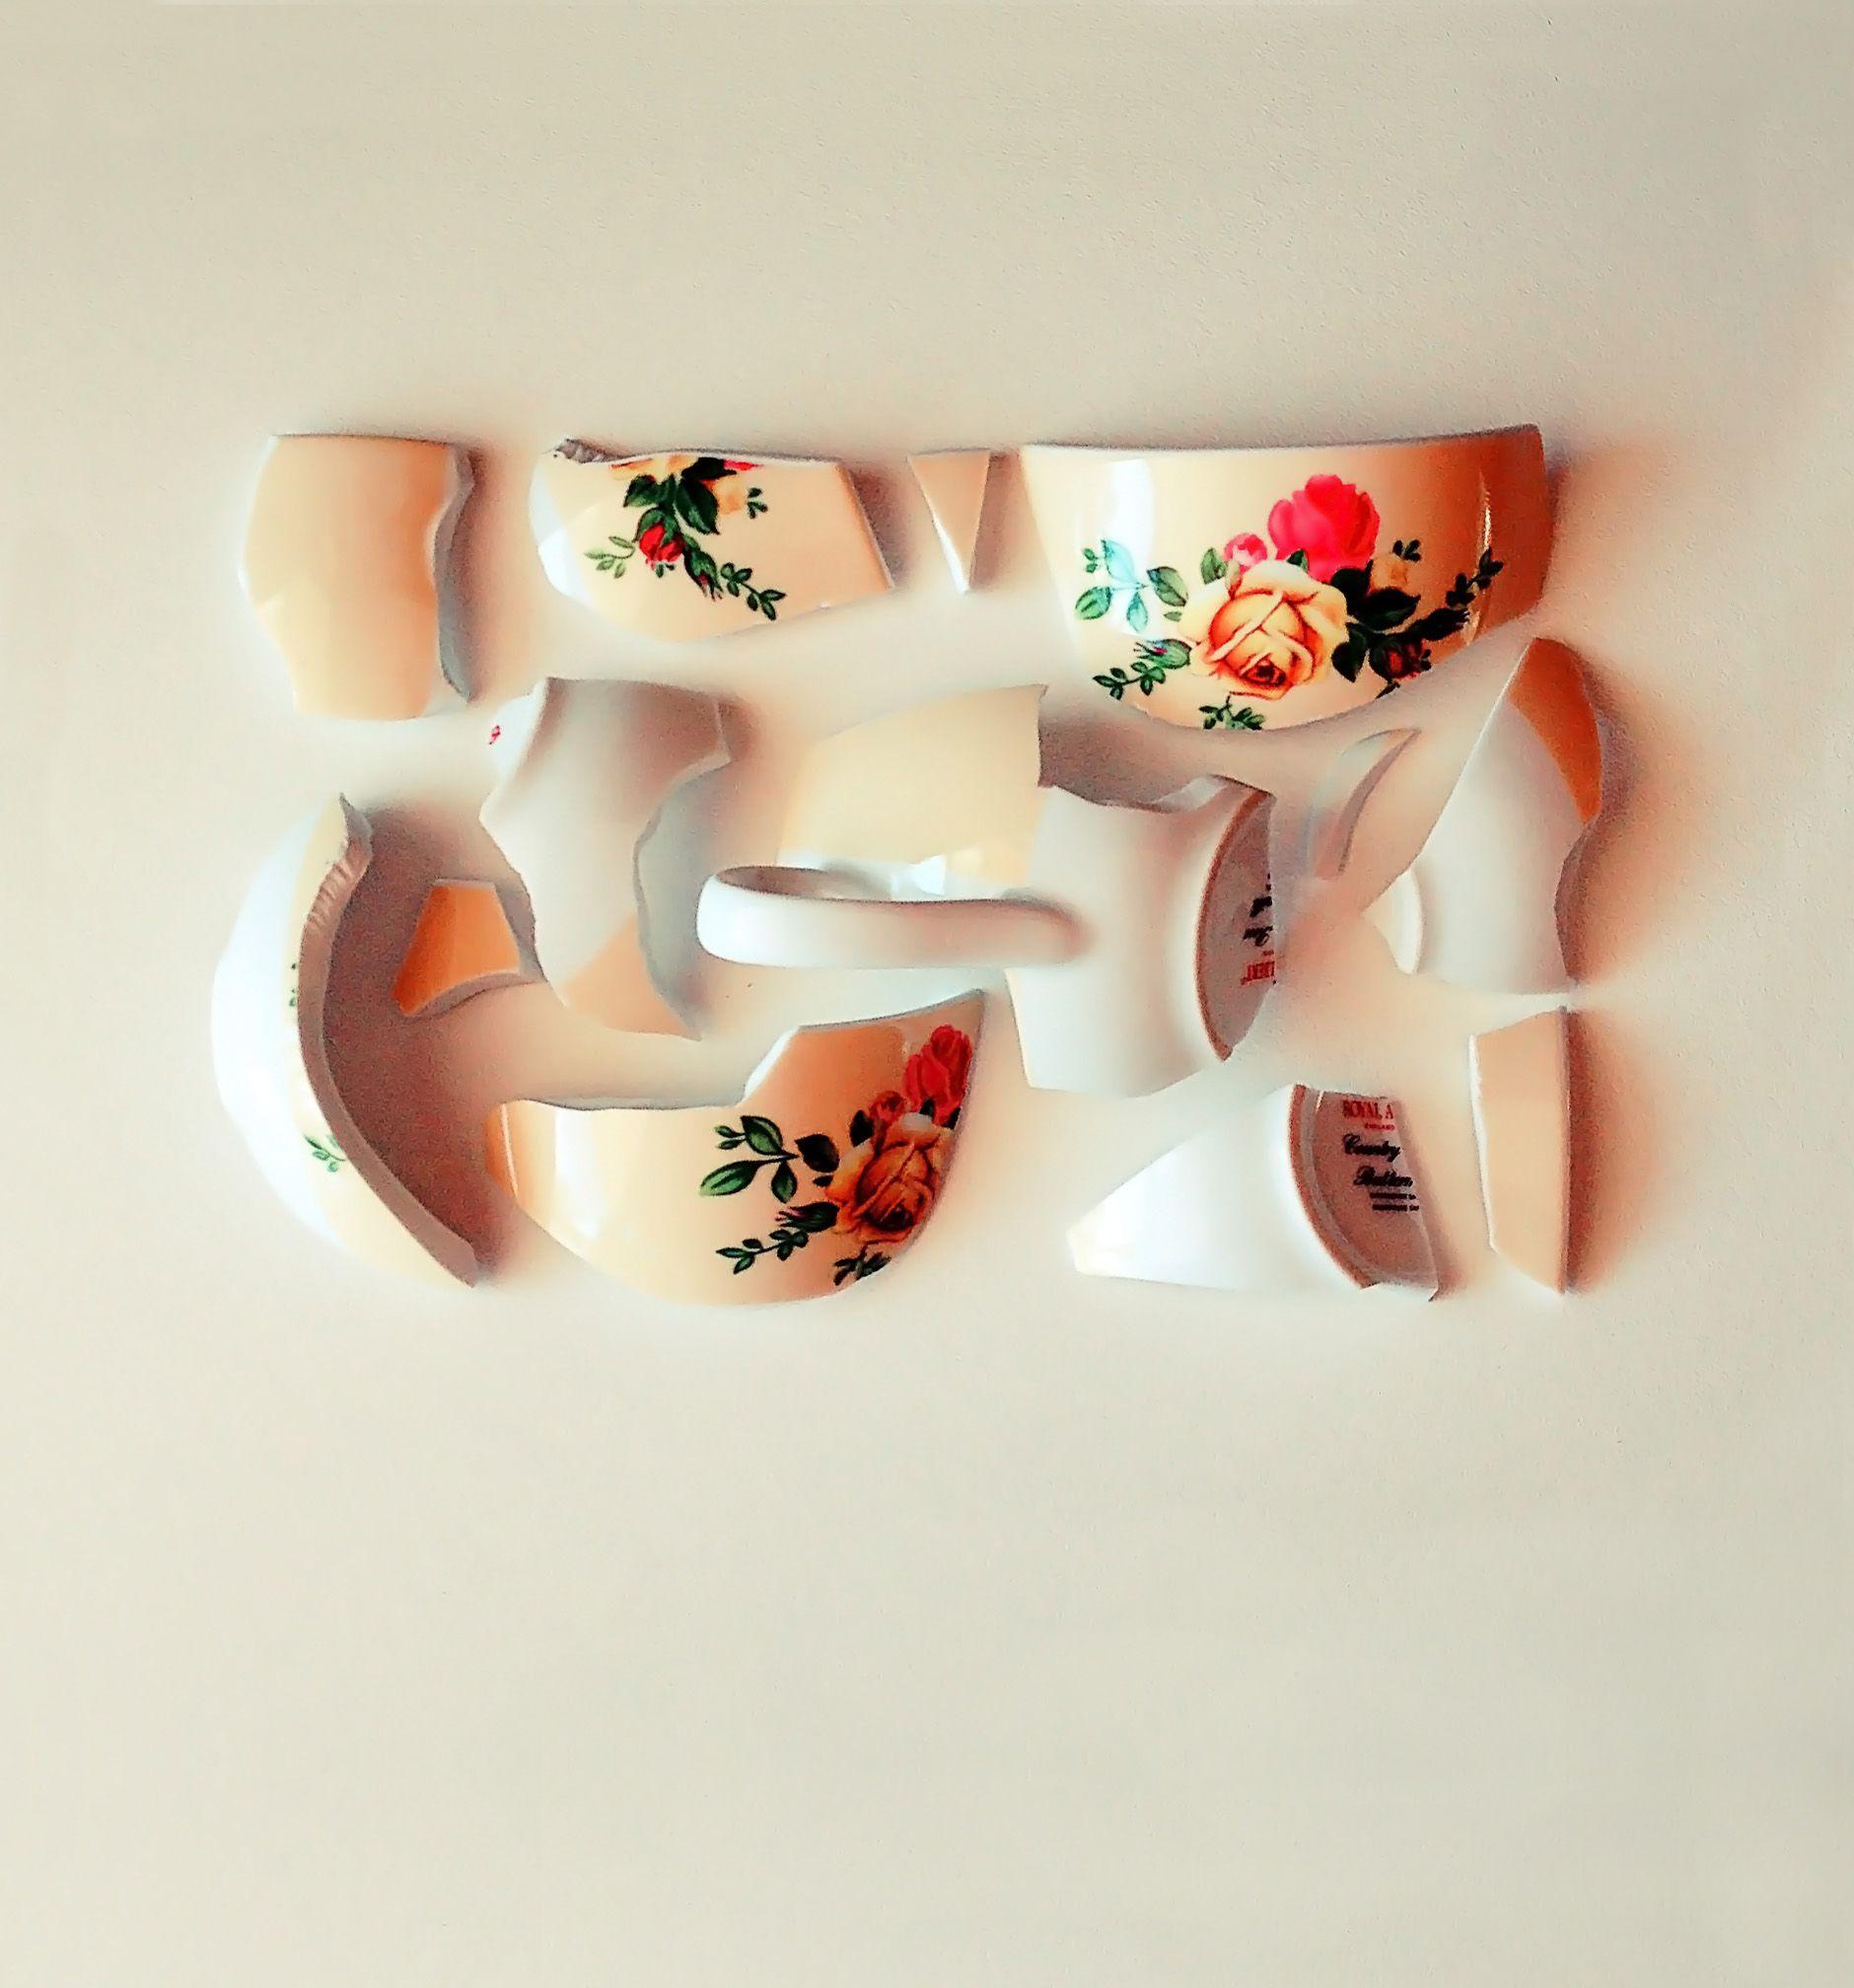 Broken Tea cup, arranged like a mosaic, by Karina Sharpe